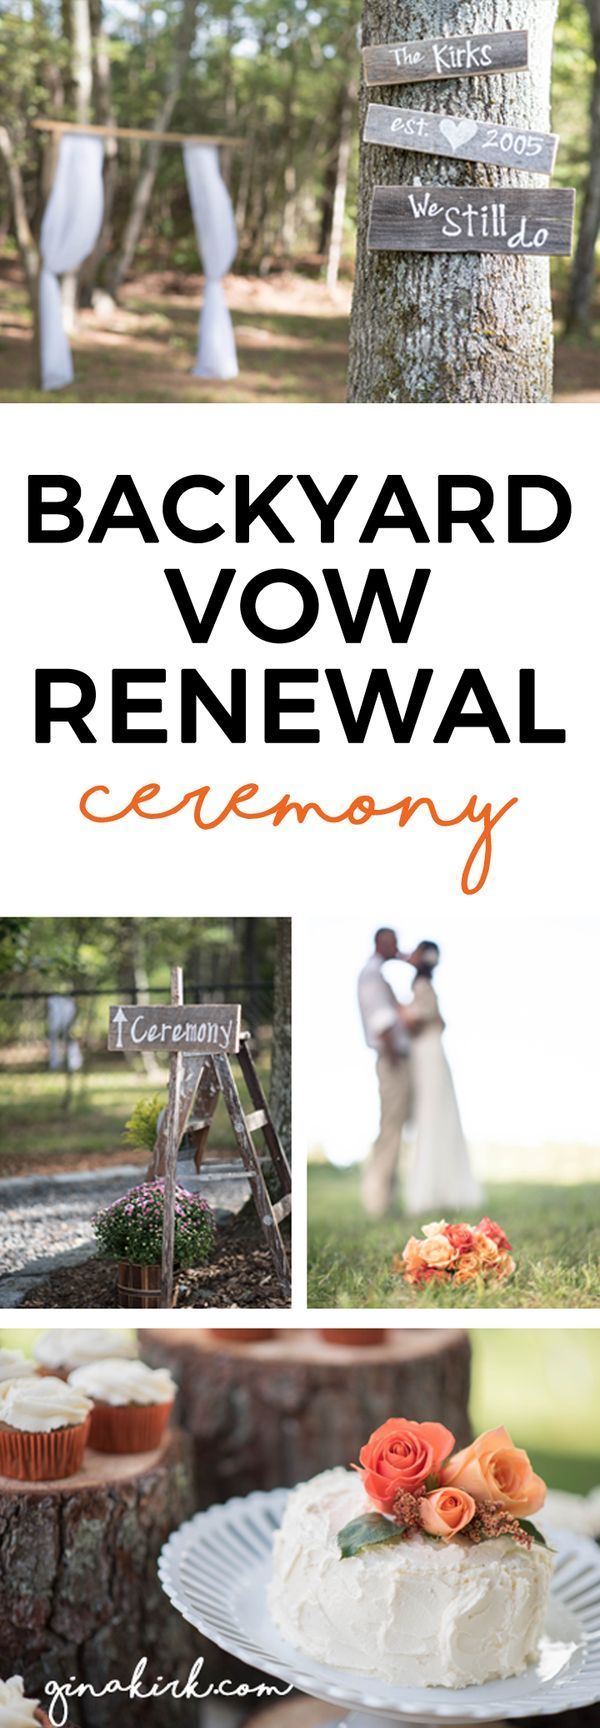 Celebrating 10 Years Our Backyard Vow Renewal Wedding